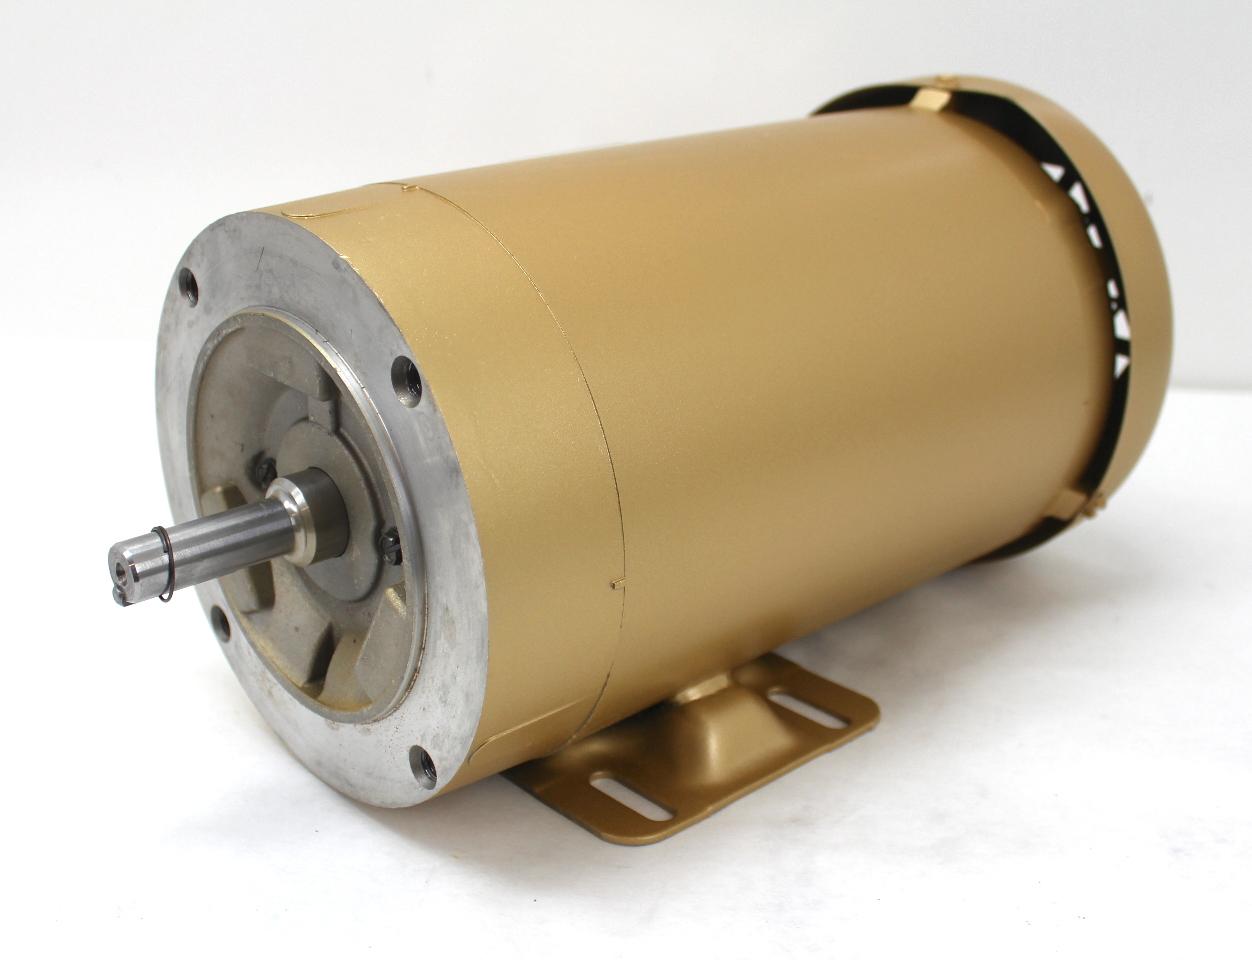 Baldor Vem3542 Electric Motor 75 Hp 1750 Rpm 56c Frame 230 460vac Tefc Ebay